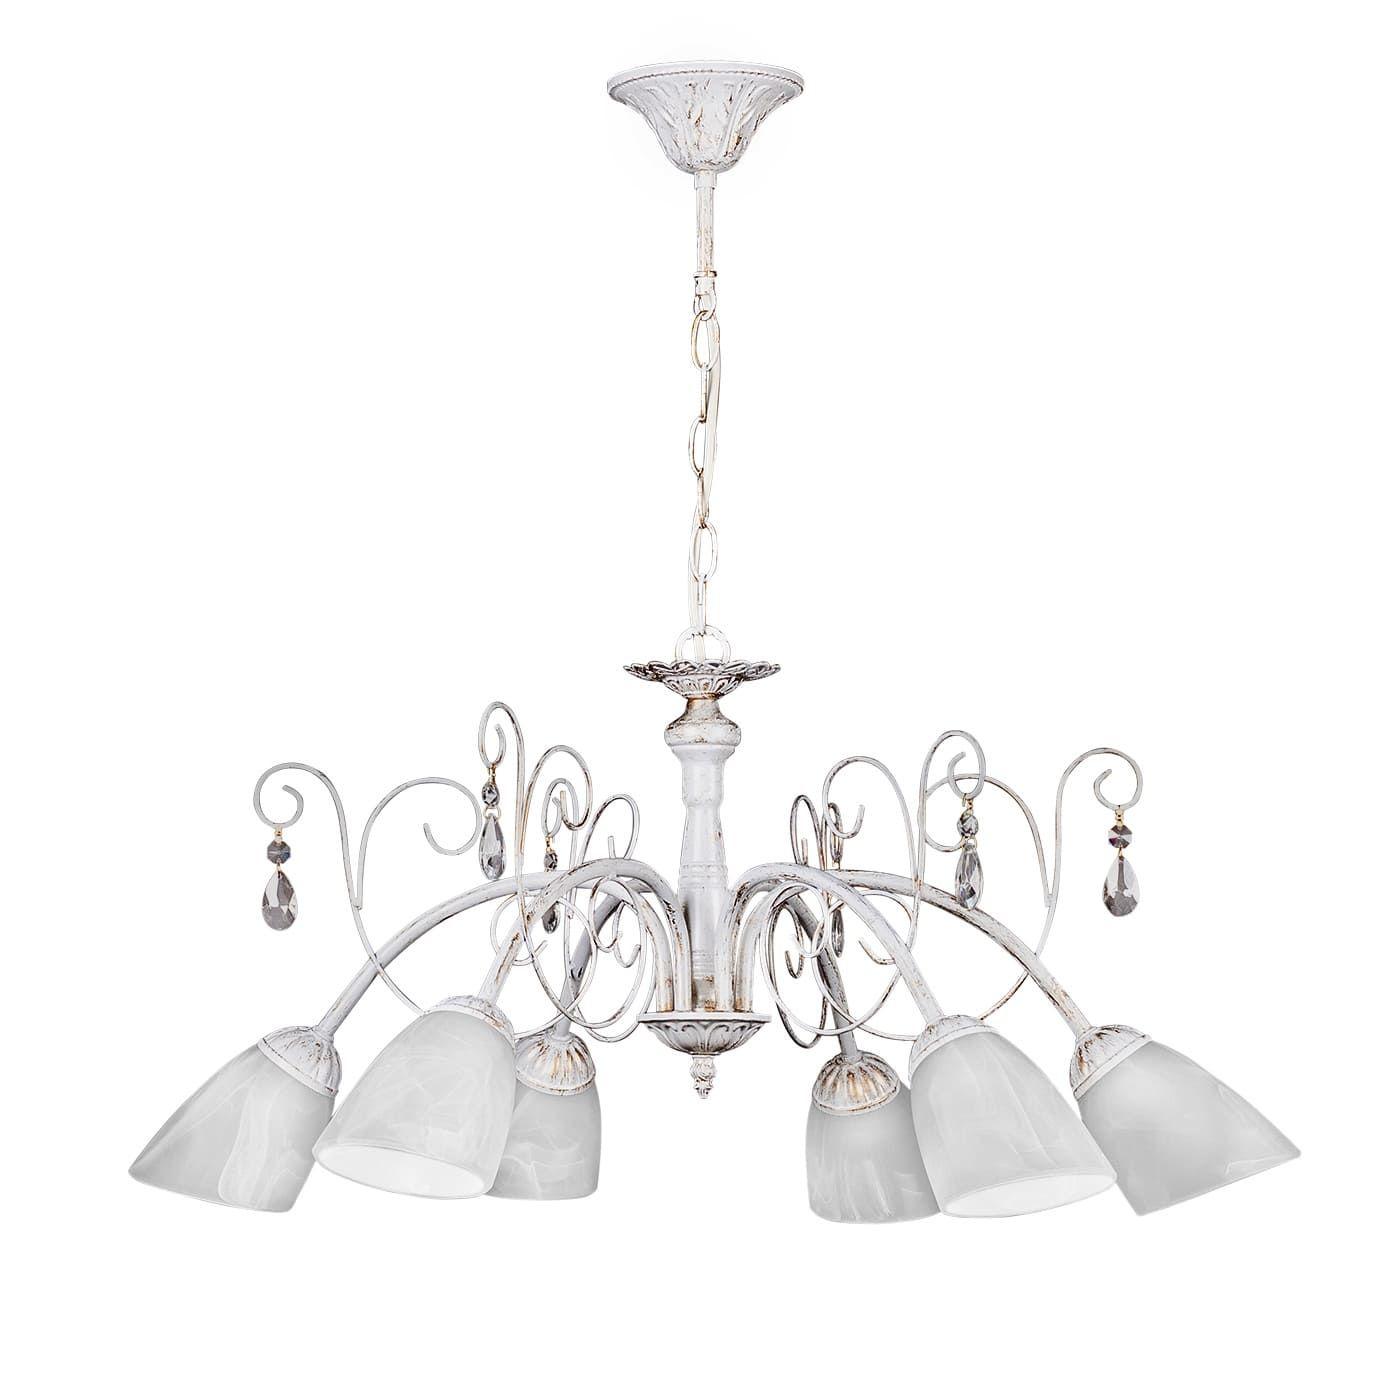 PETRASVET / Pendant chandelier S2020-6, 6xE14 max. 60W